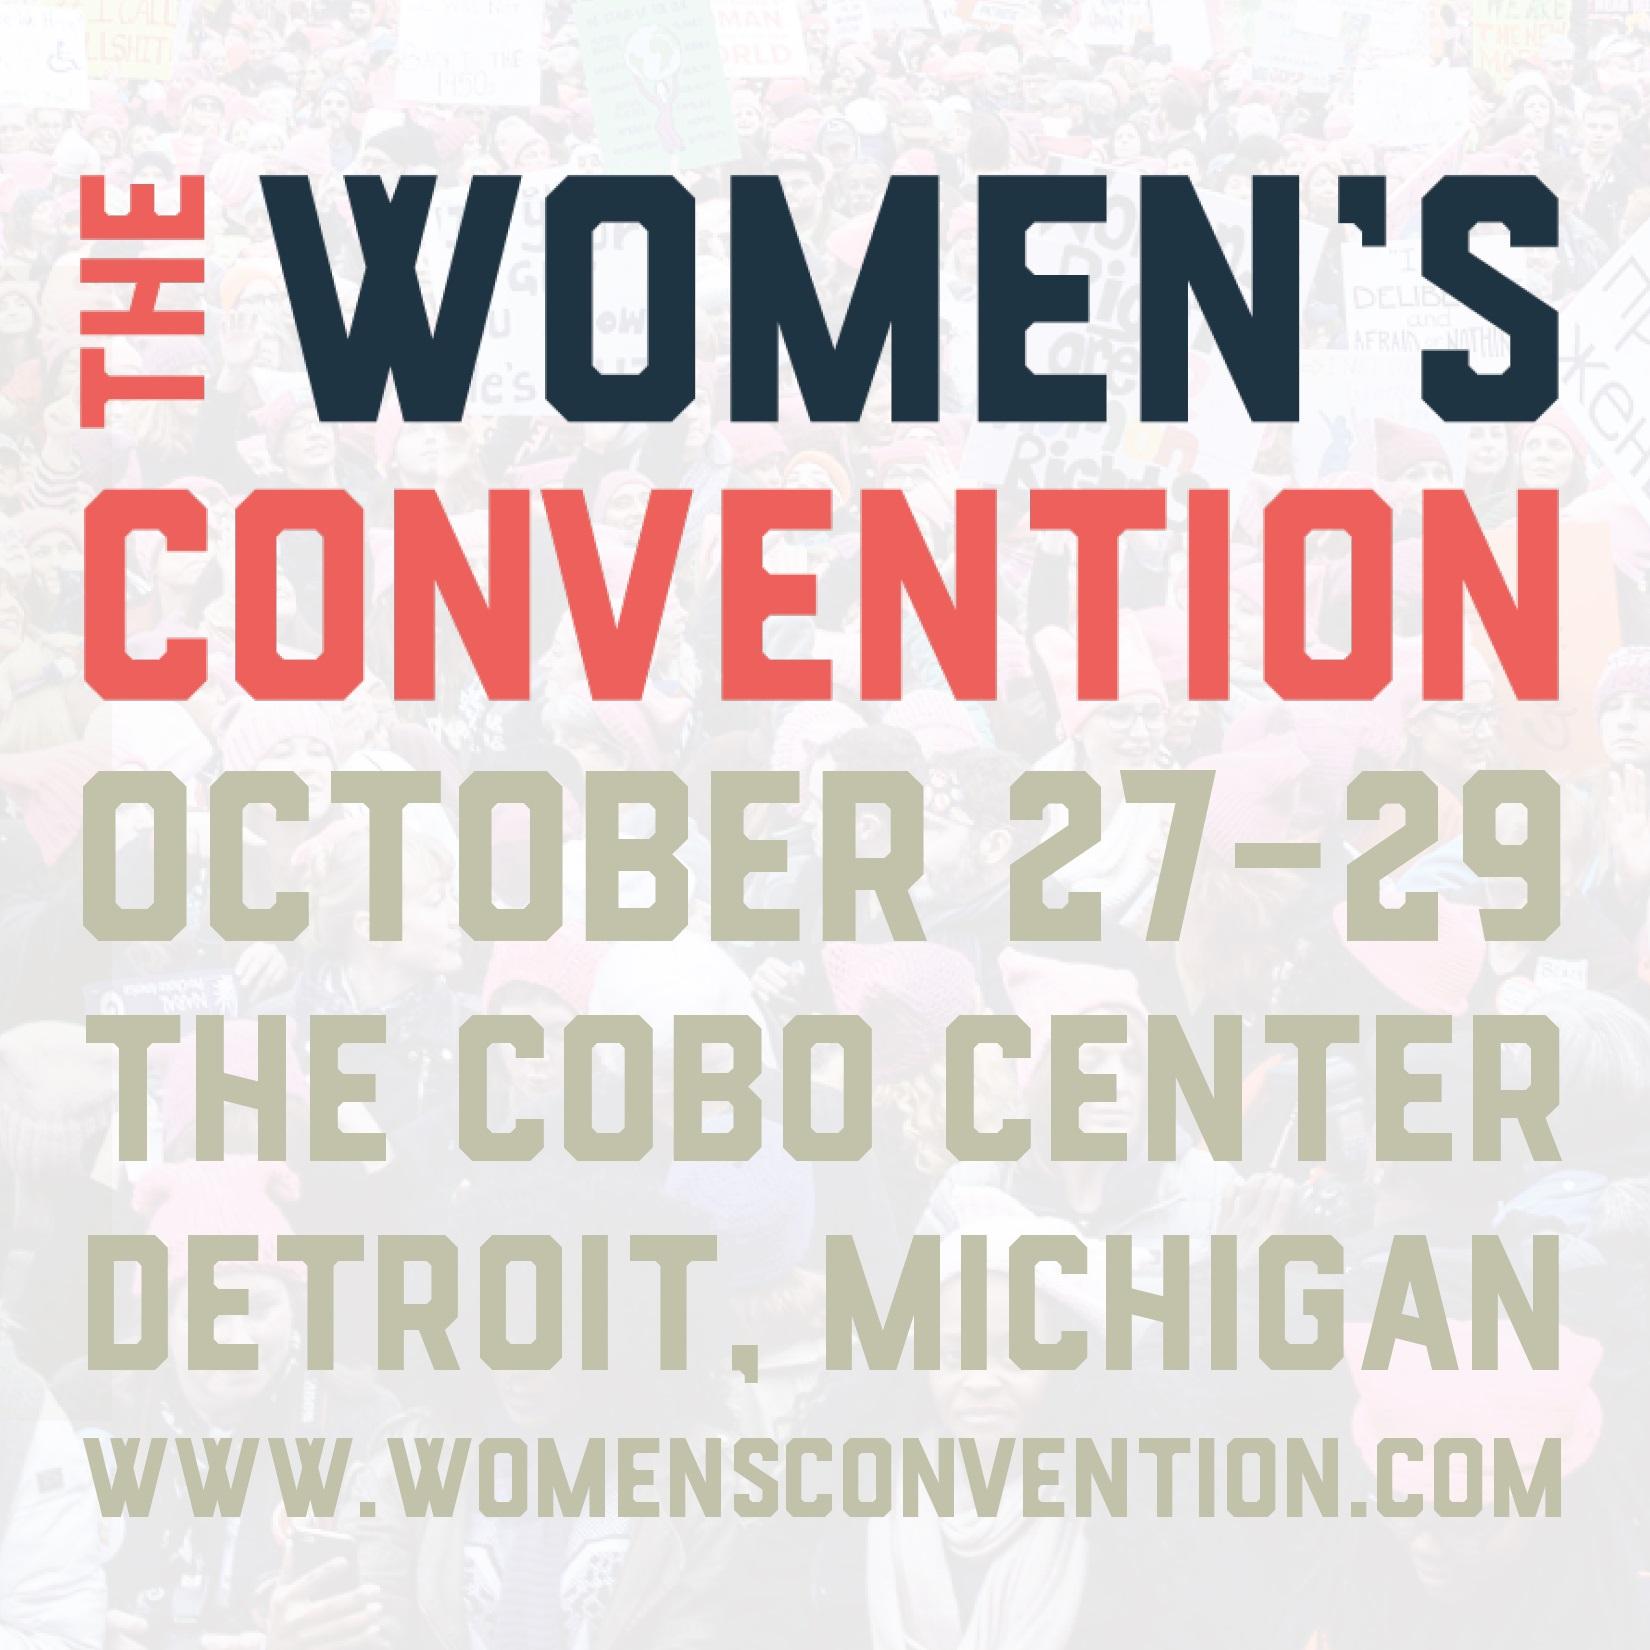 WomensConventionSquare_(3).jpg